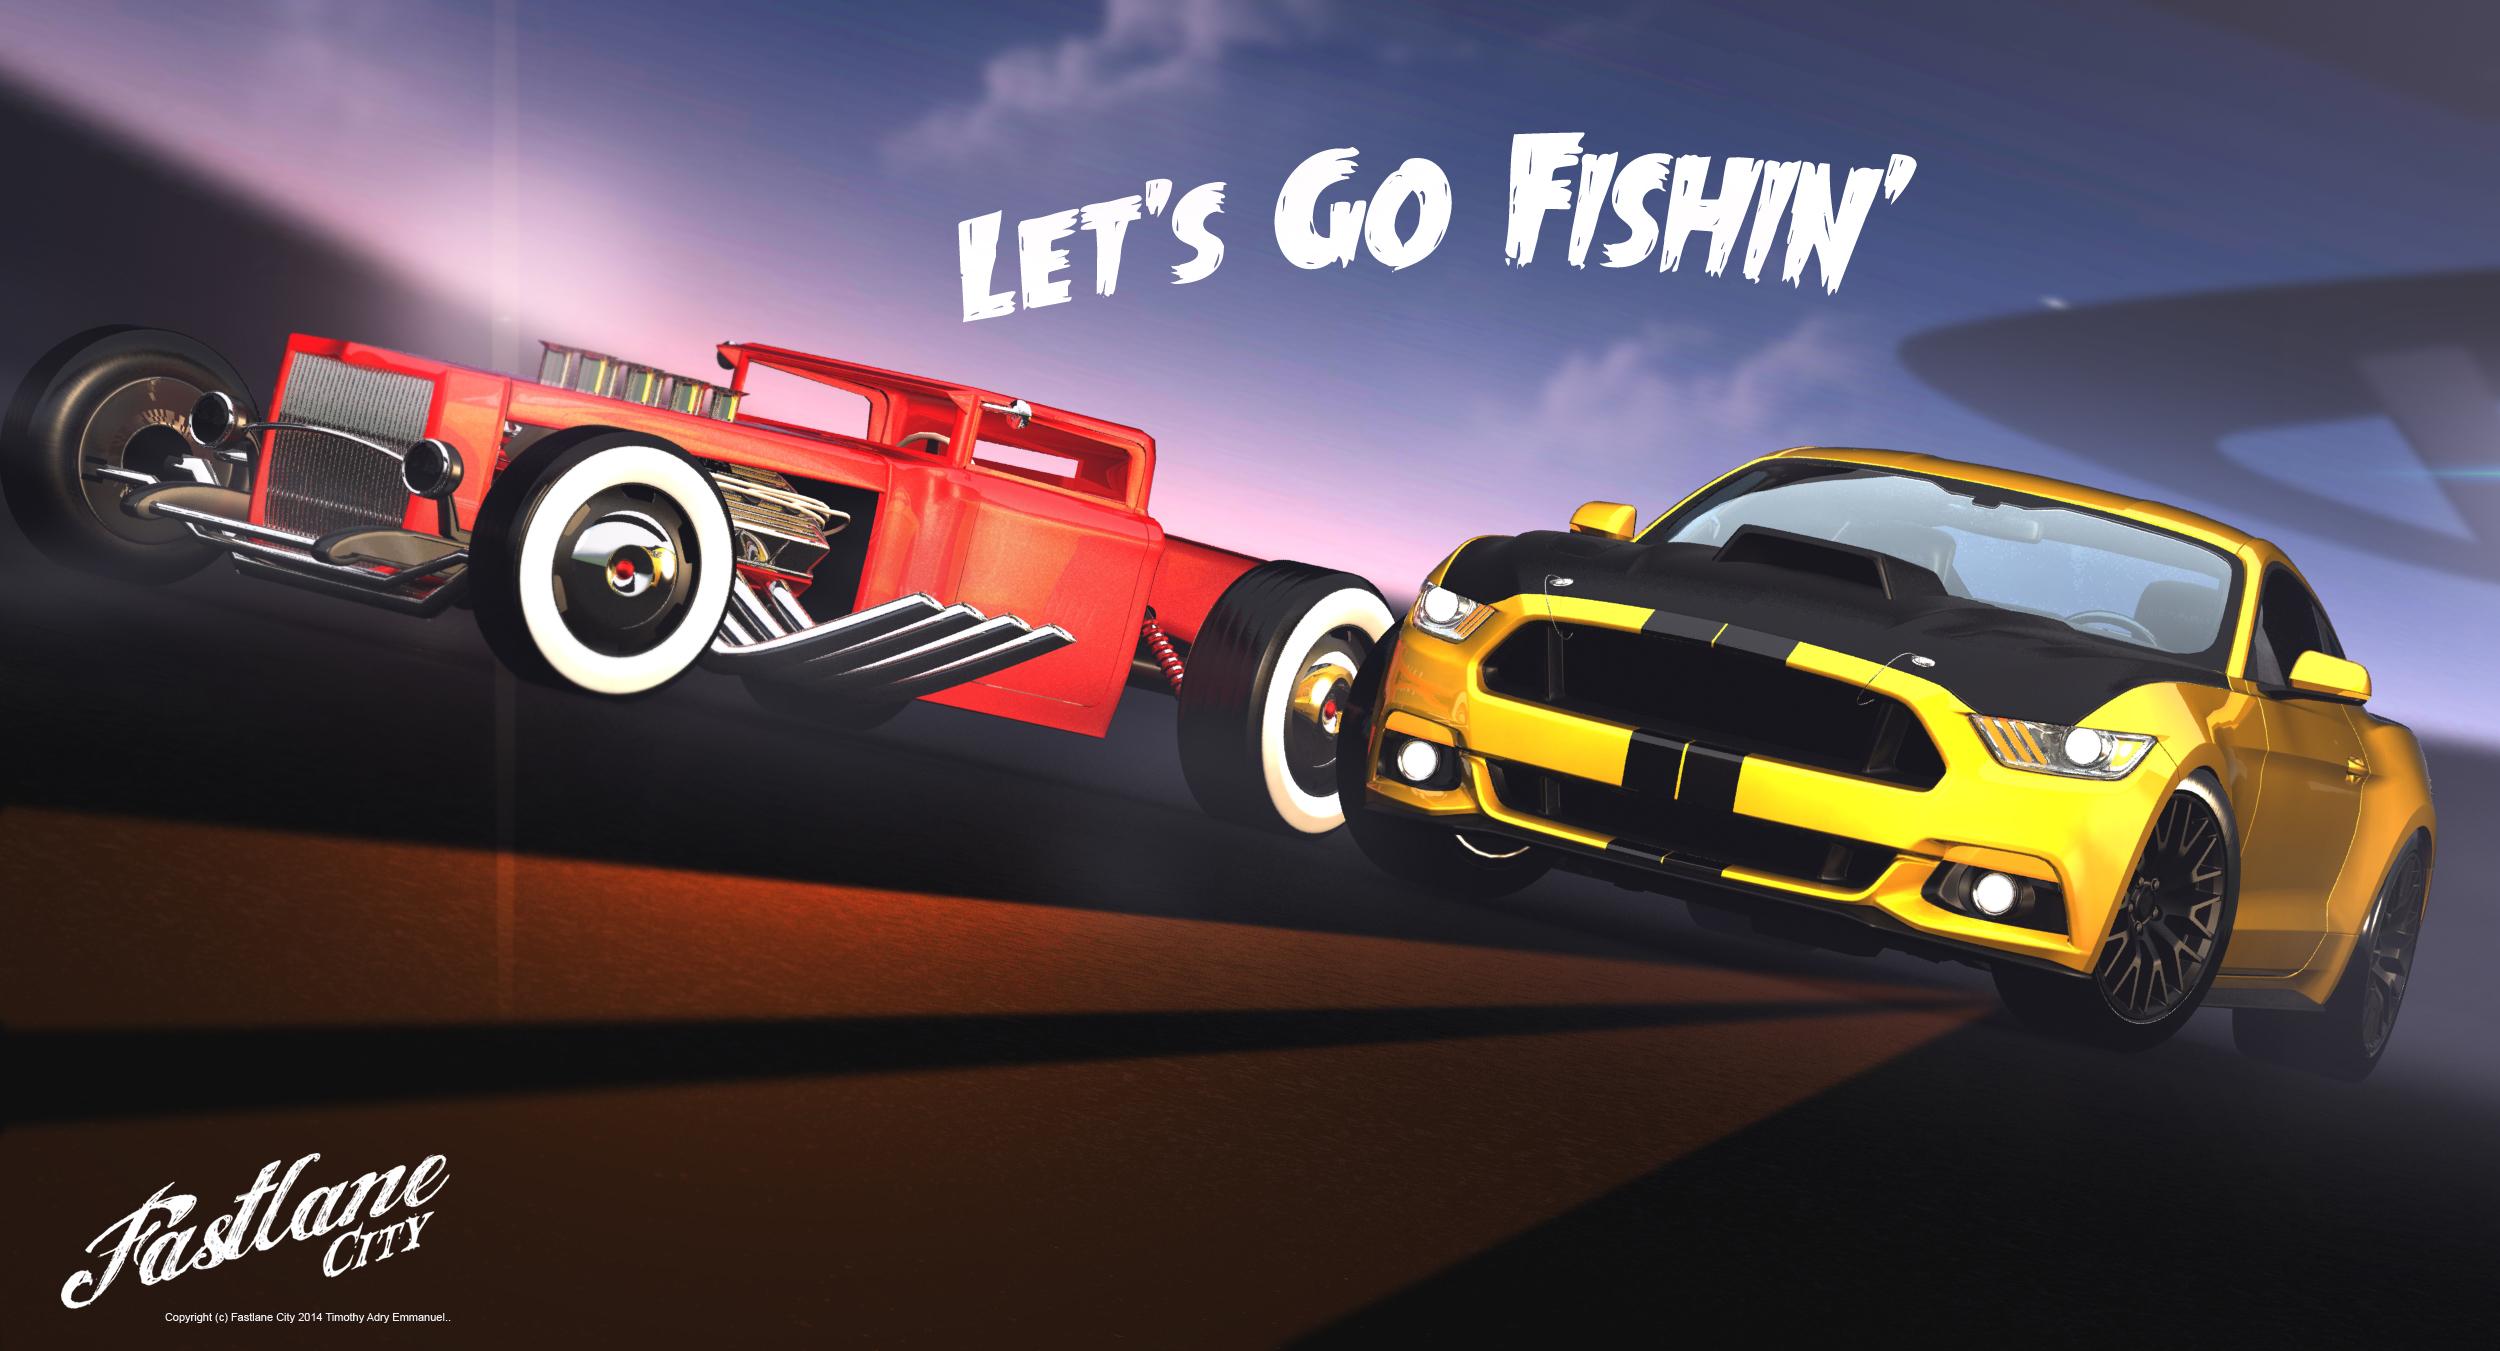 Fastlane City - LET'S GO FISHIN' by Adry53